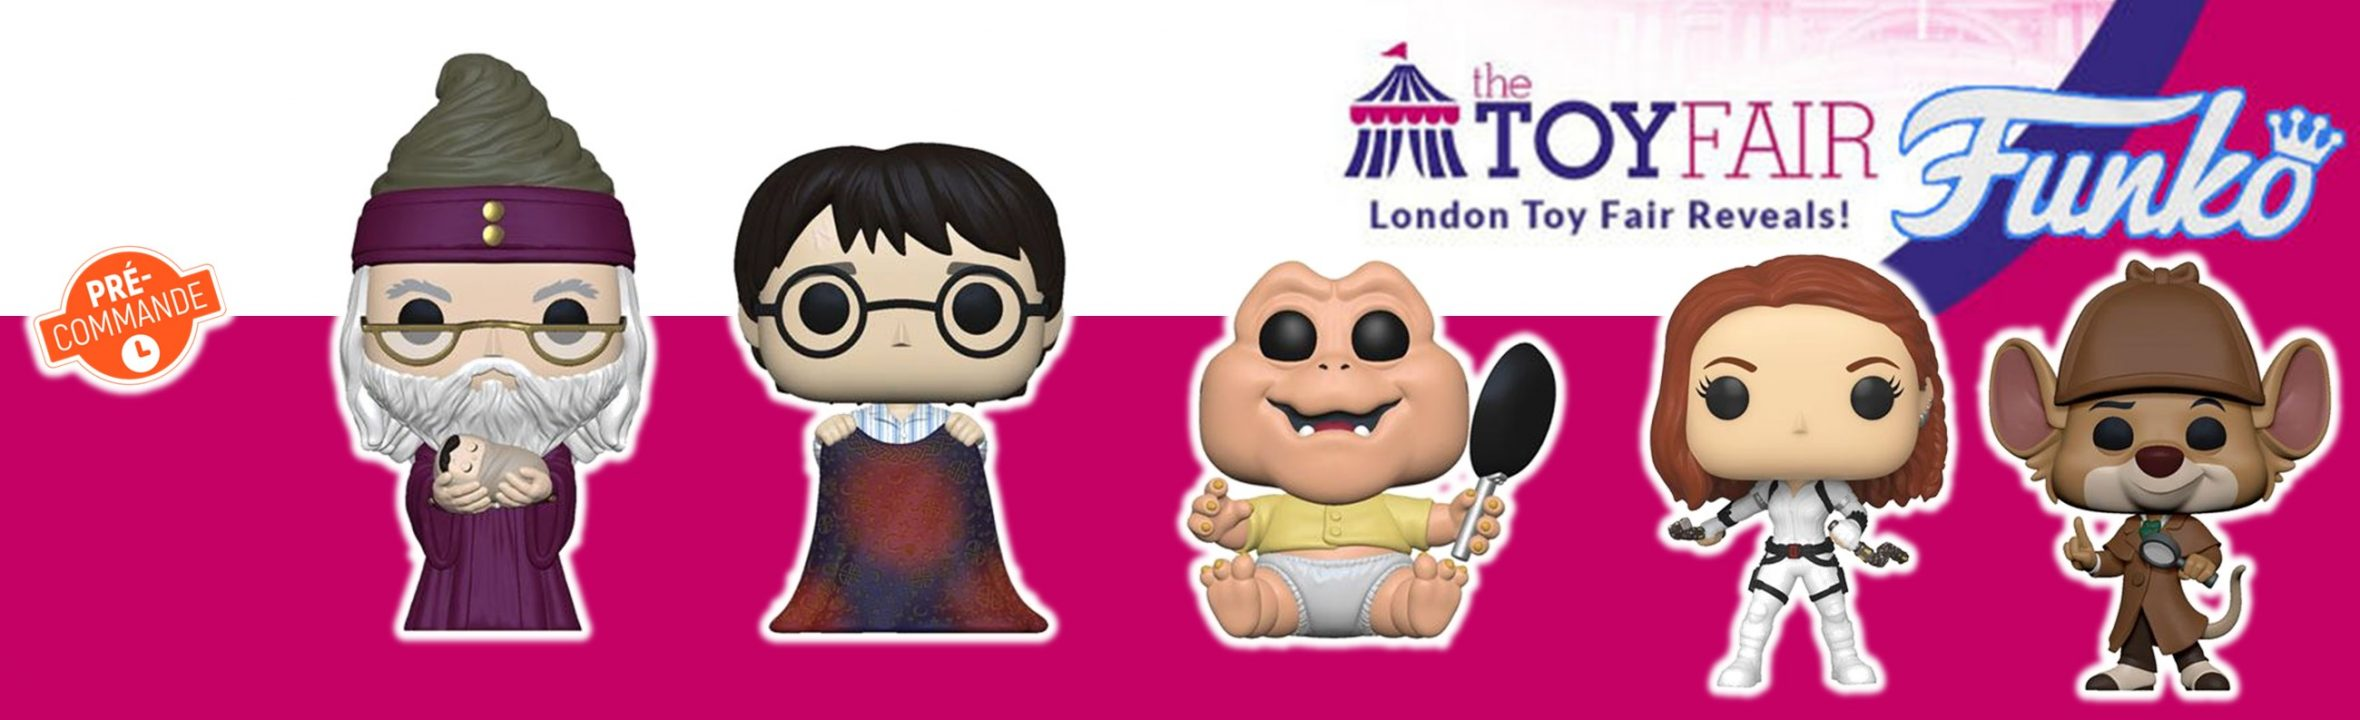 precommande london toy fair funko pop